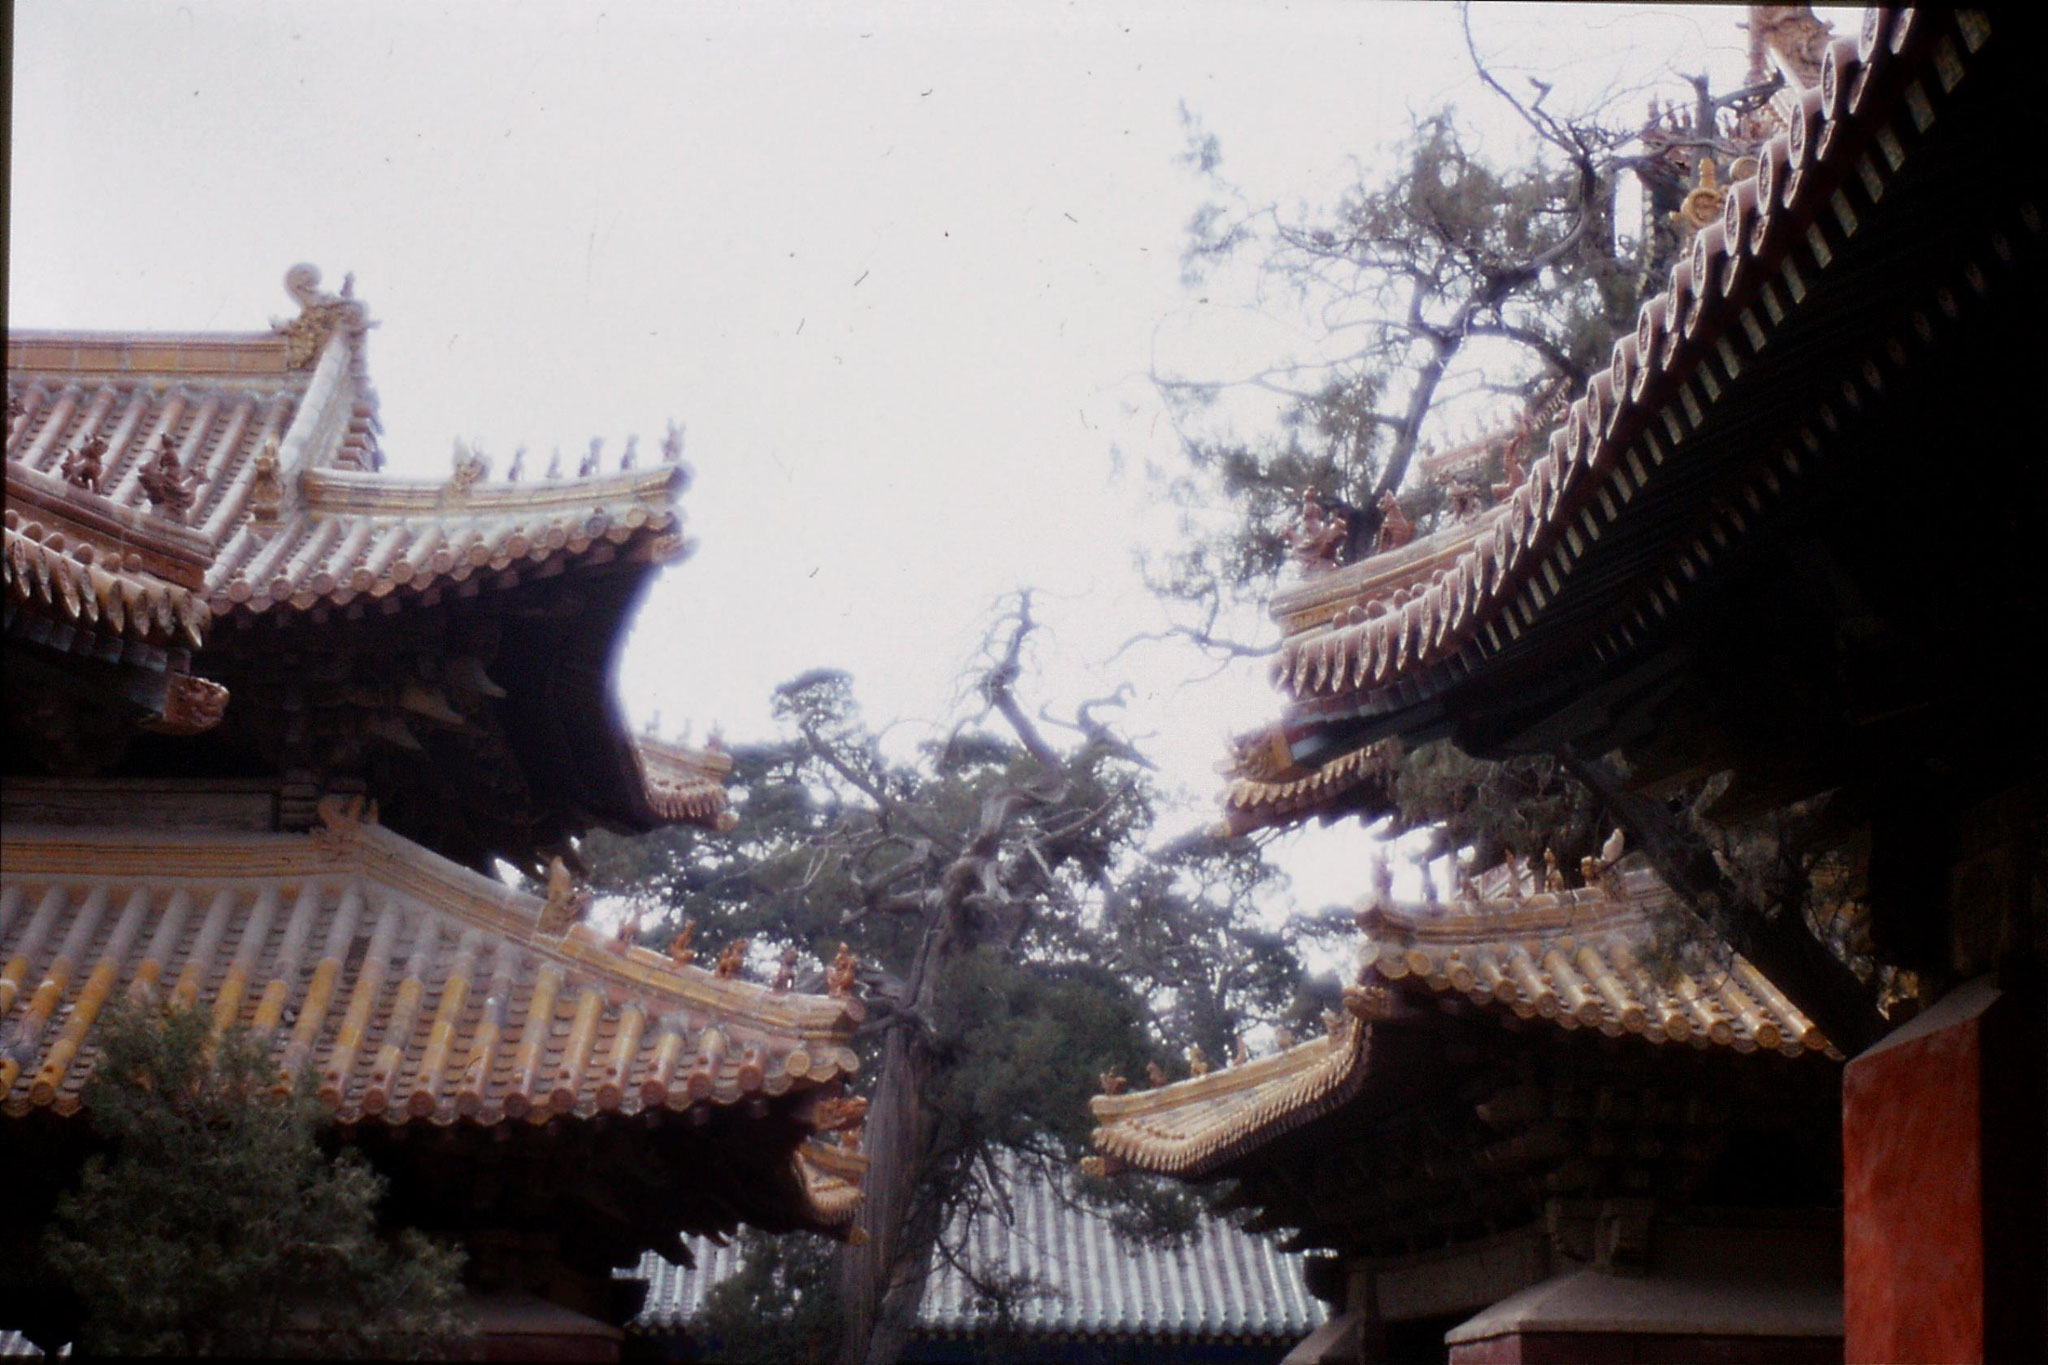 21/2/1989: 0: Qufu temple